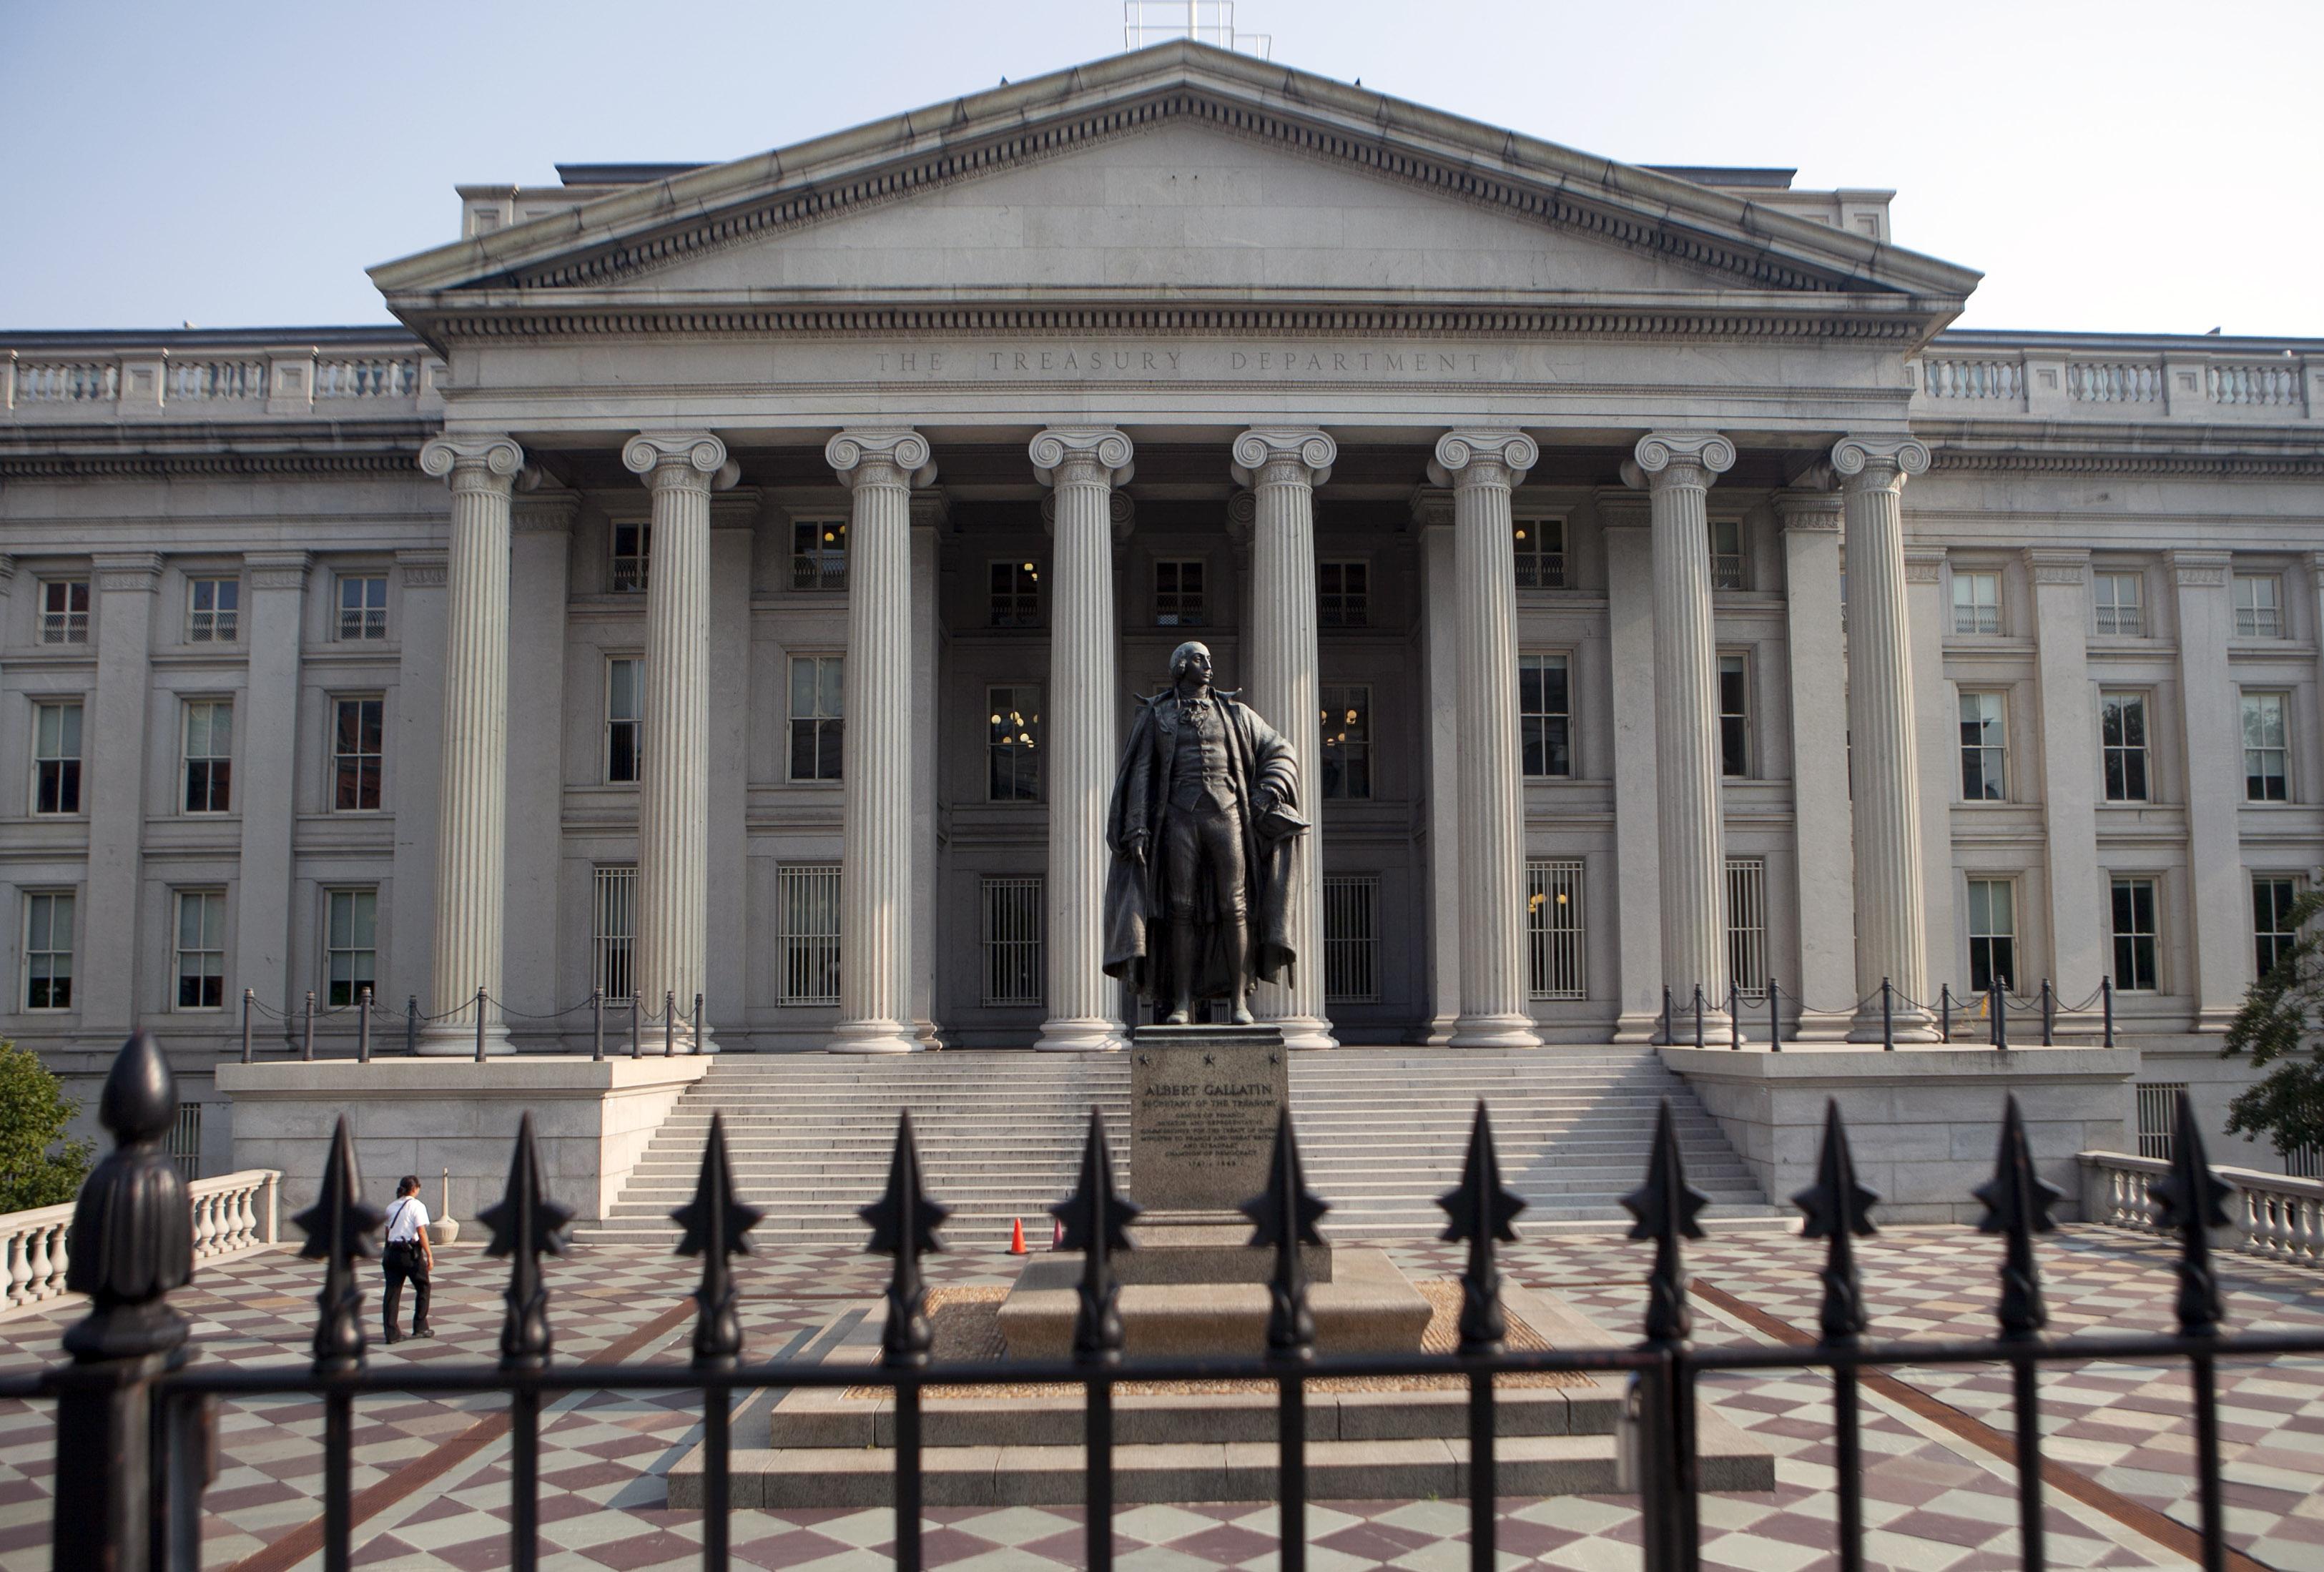 https://assets.sourcemedia.com/37/6a/7b22a8214d3da3c354bb284b0ccf/treasury-building-bl-101717.jpg